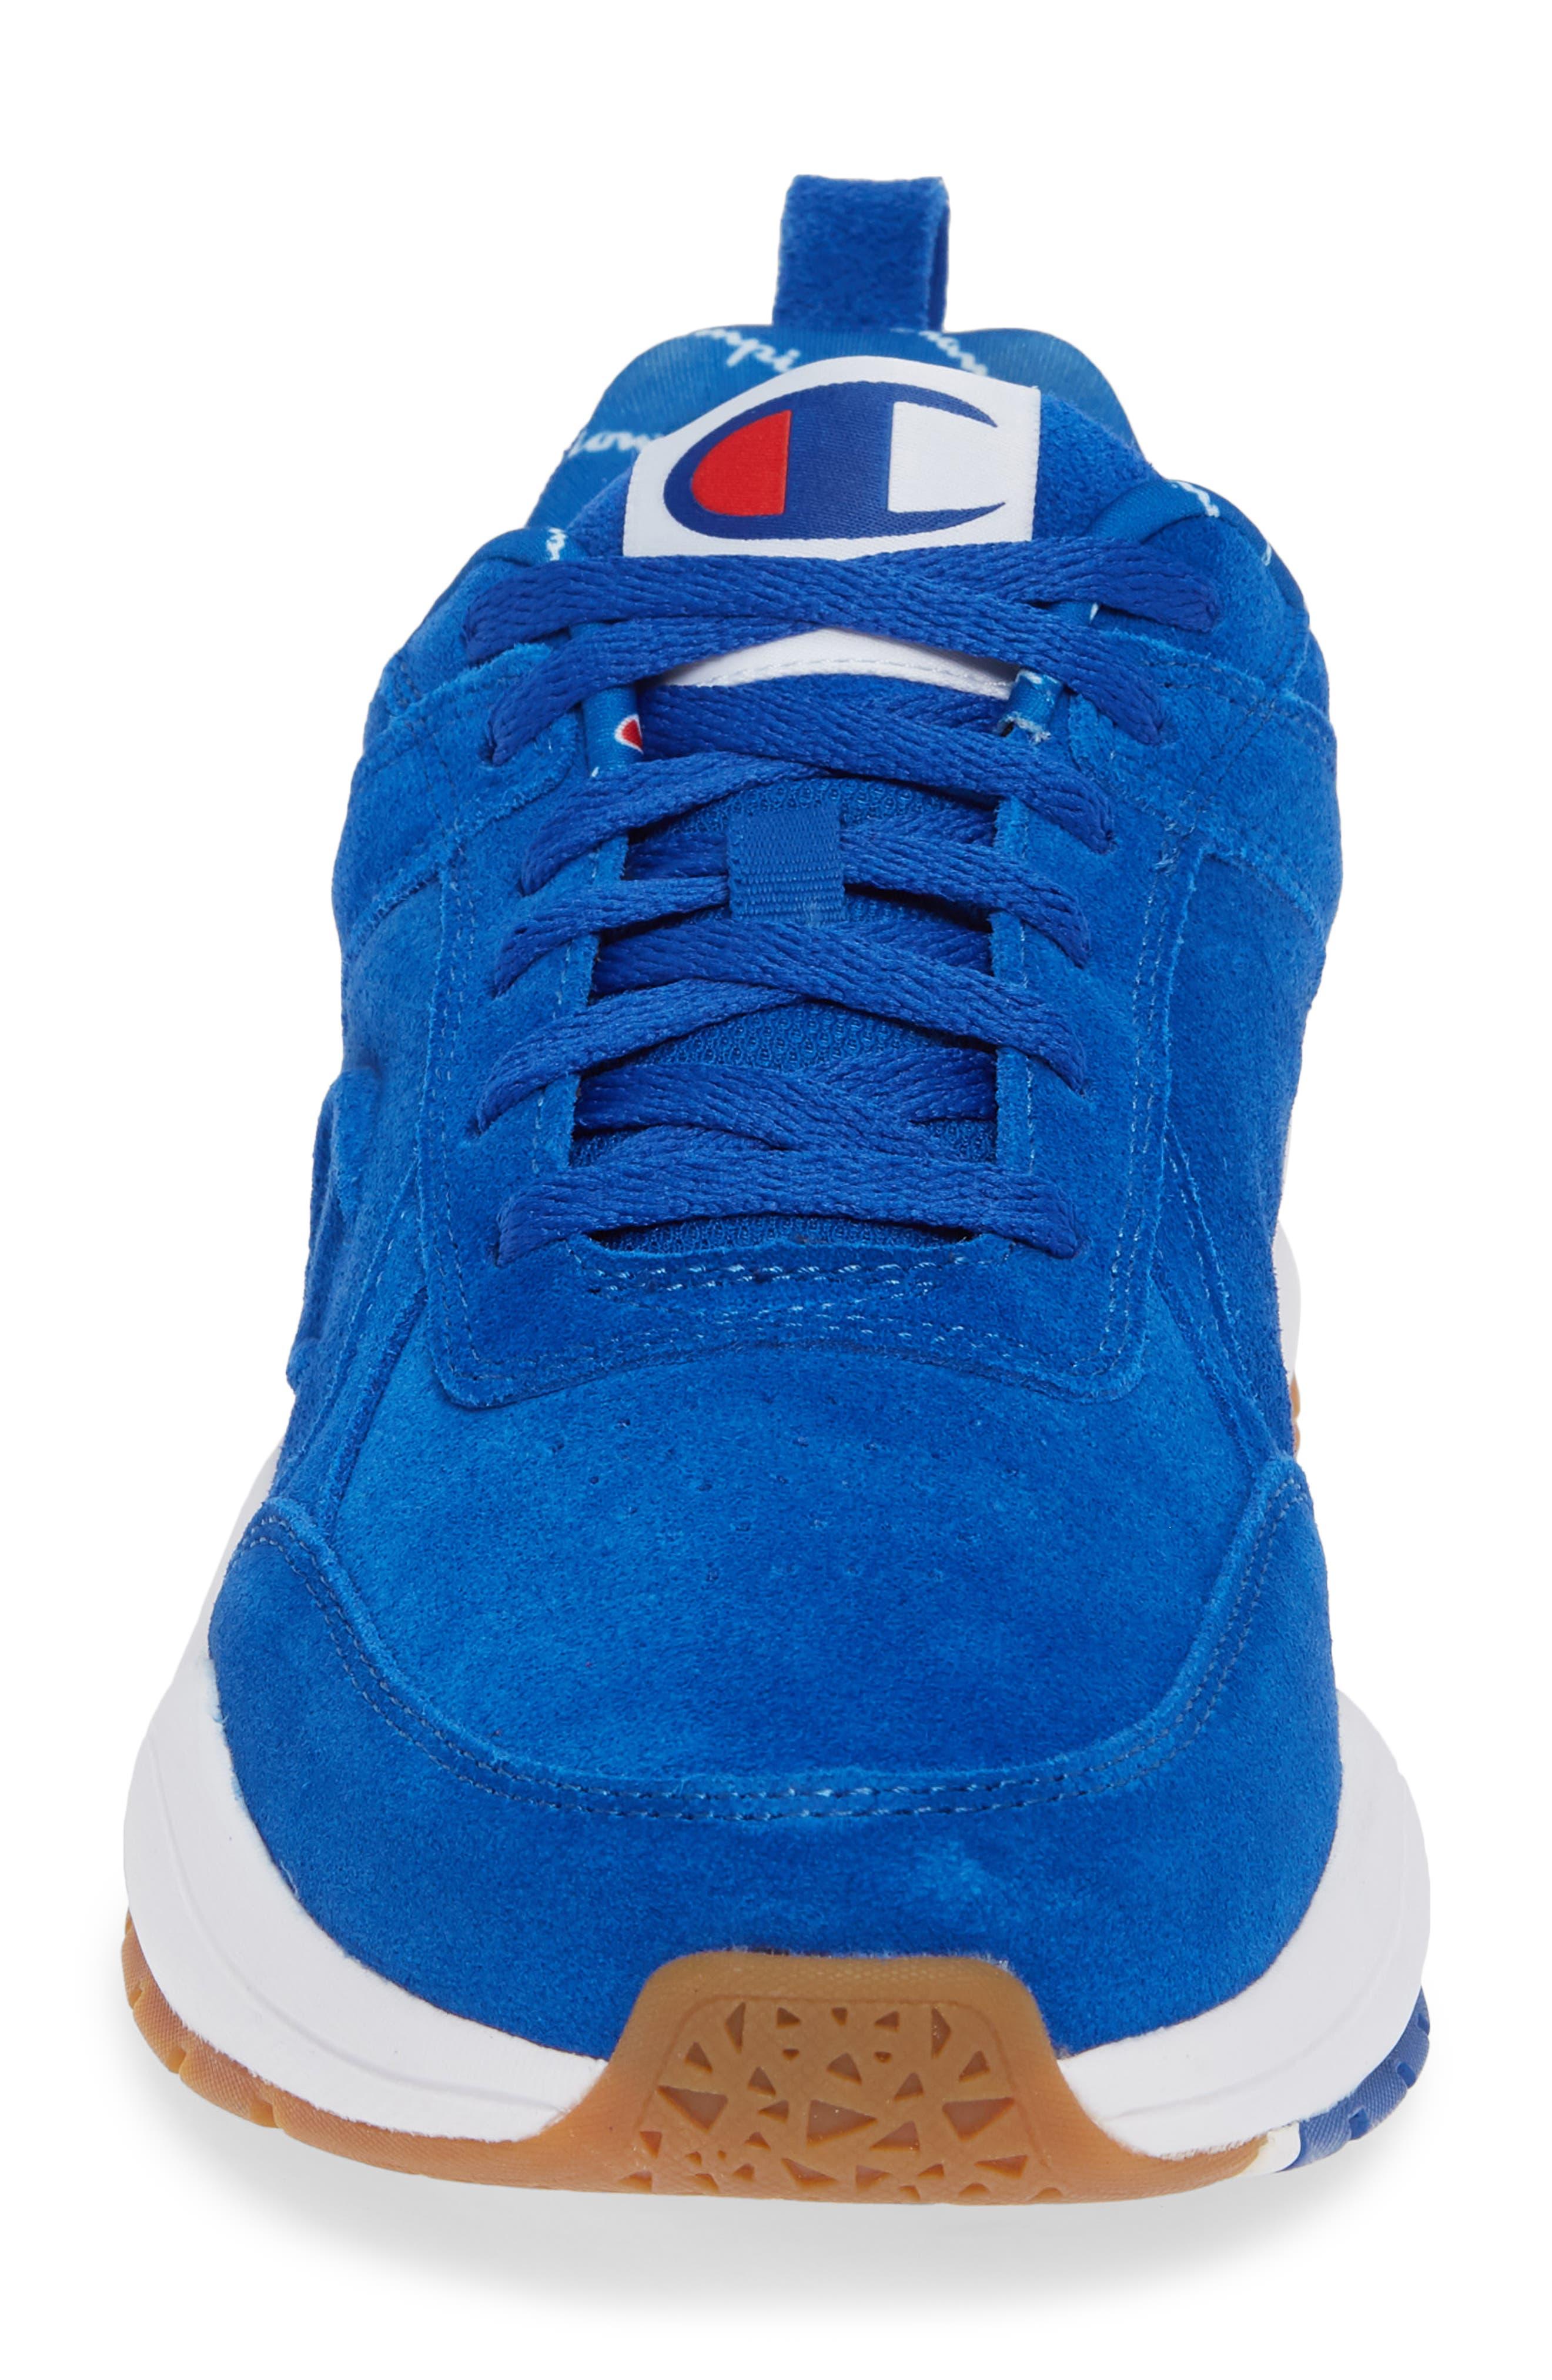 93Eighteen Sneaker,                             Alternate thumbnail 4, color,                             BLUE SUEDE